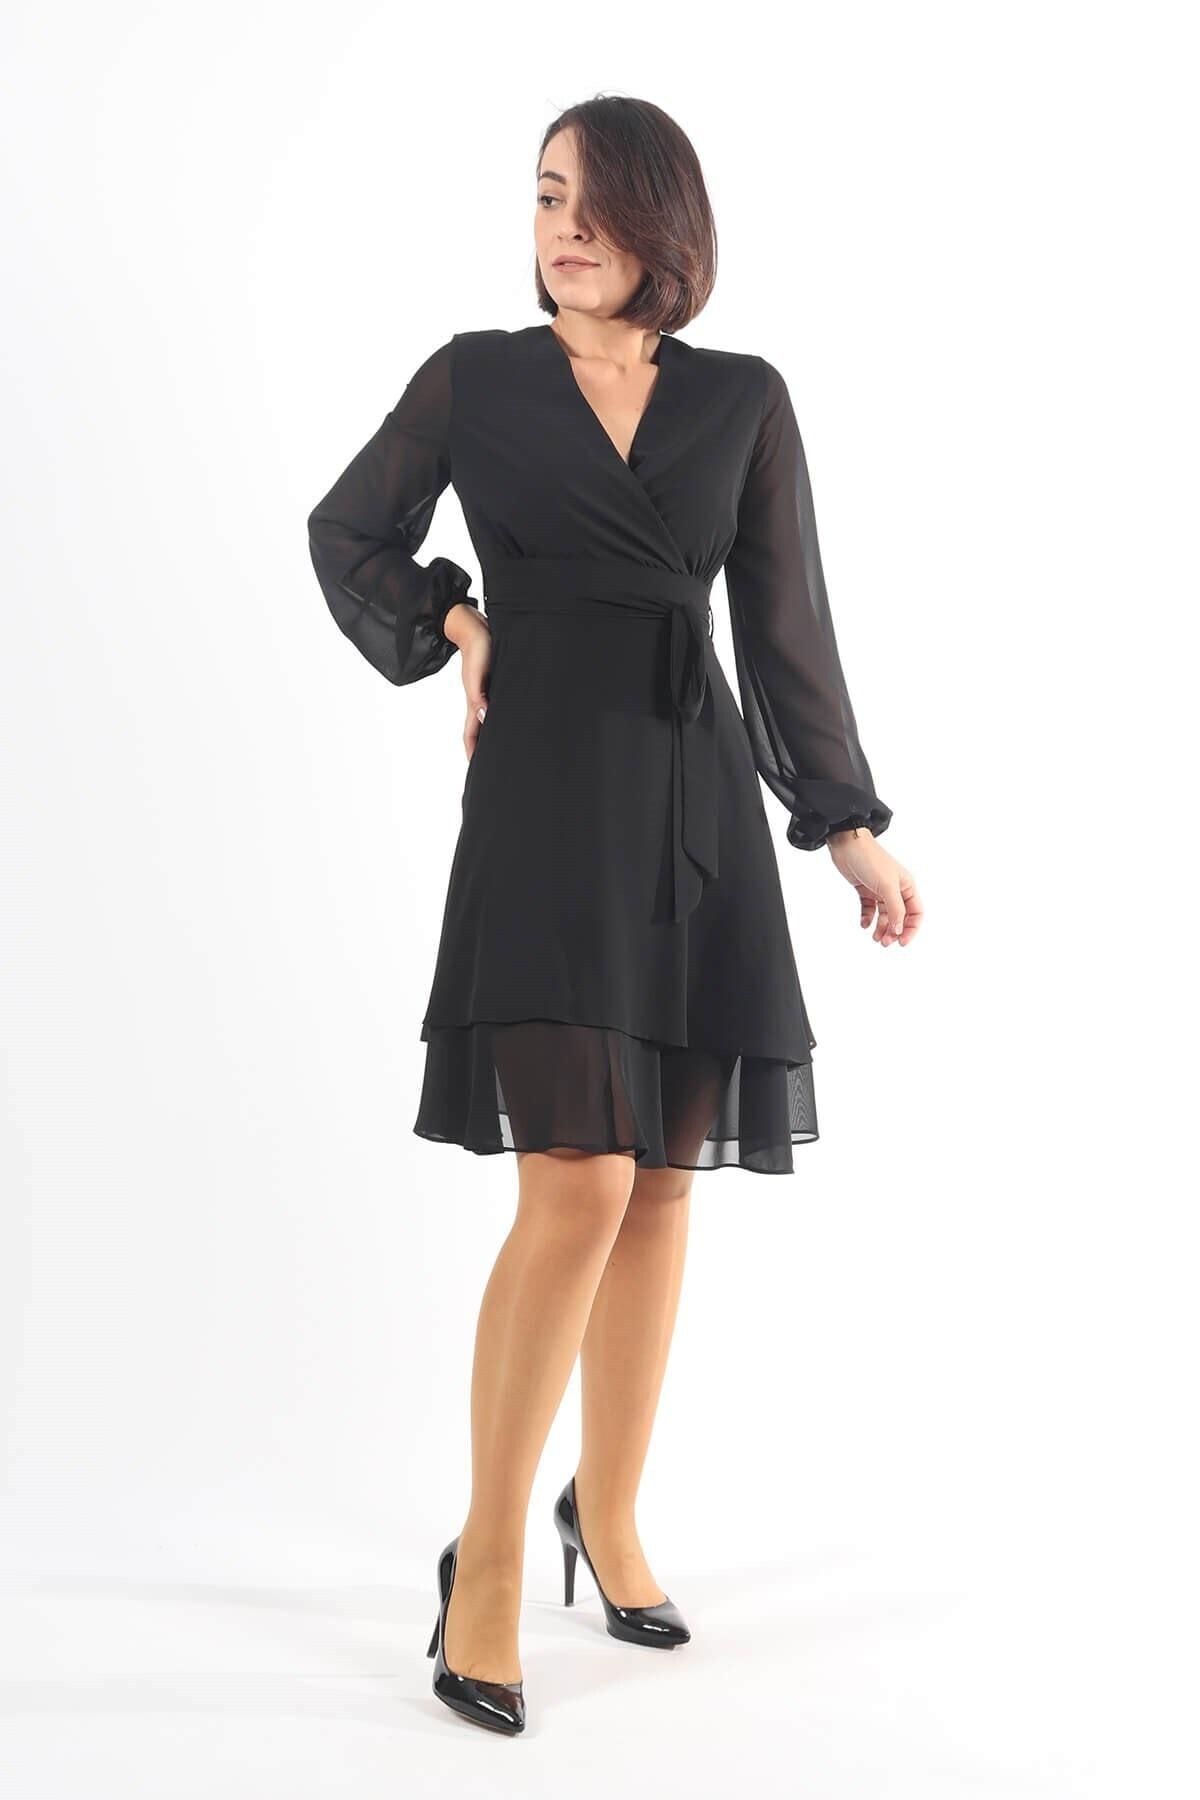 FAZZA FABRİKA Siyah Şifon Kruvze Elbise